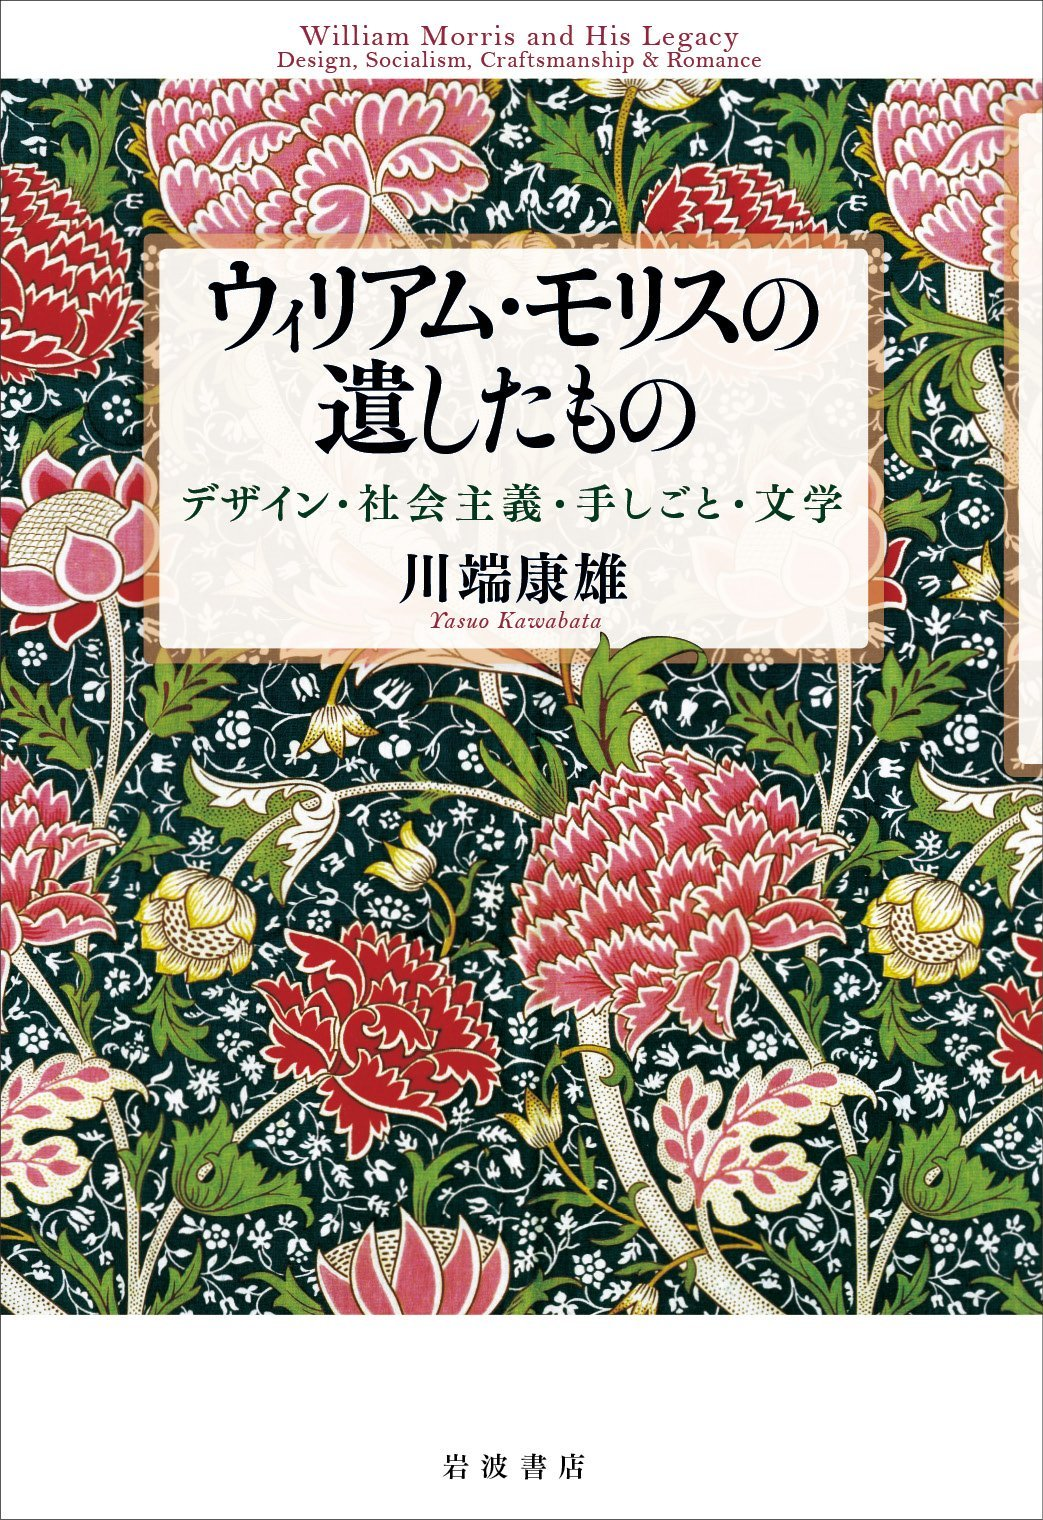 Amazon.co.jp: ウィリアム・モリスの遺したもの――デザイン・社会主義 ...